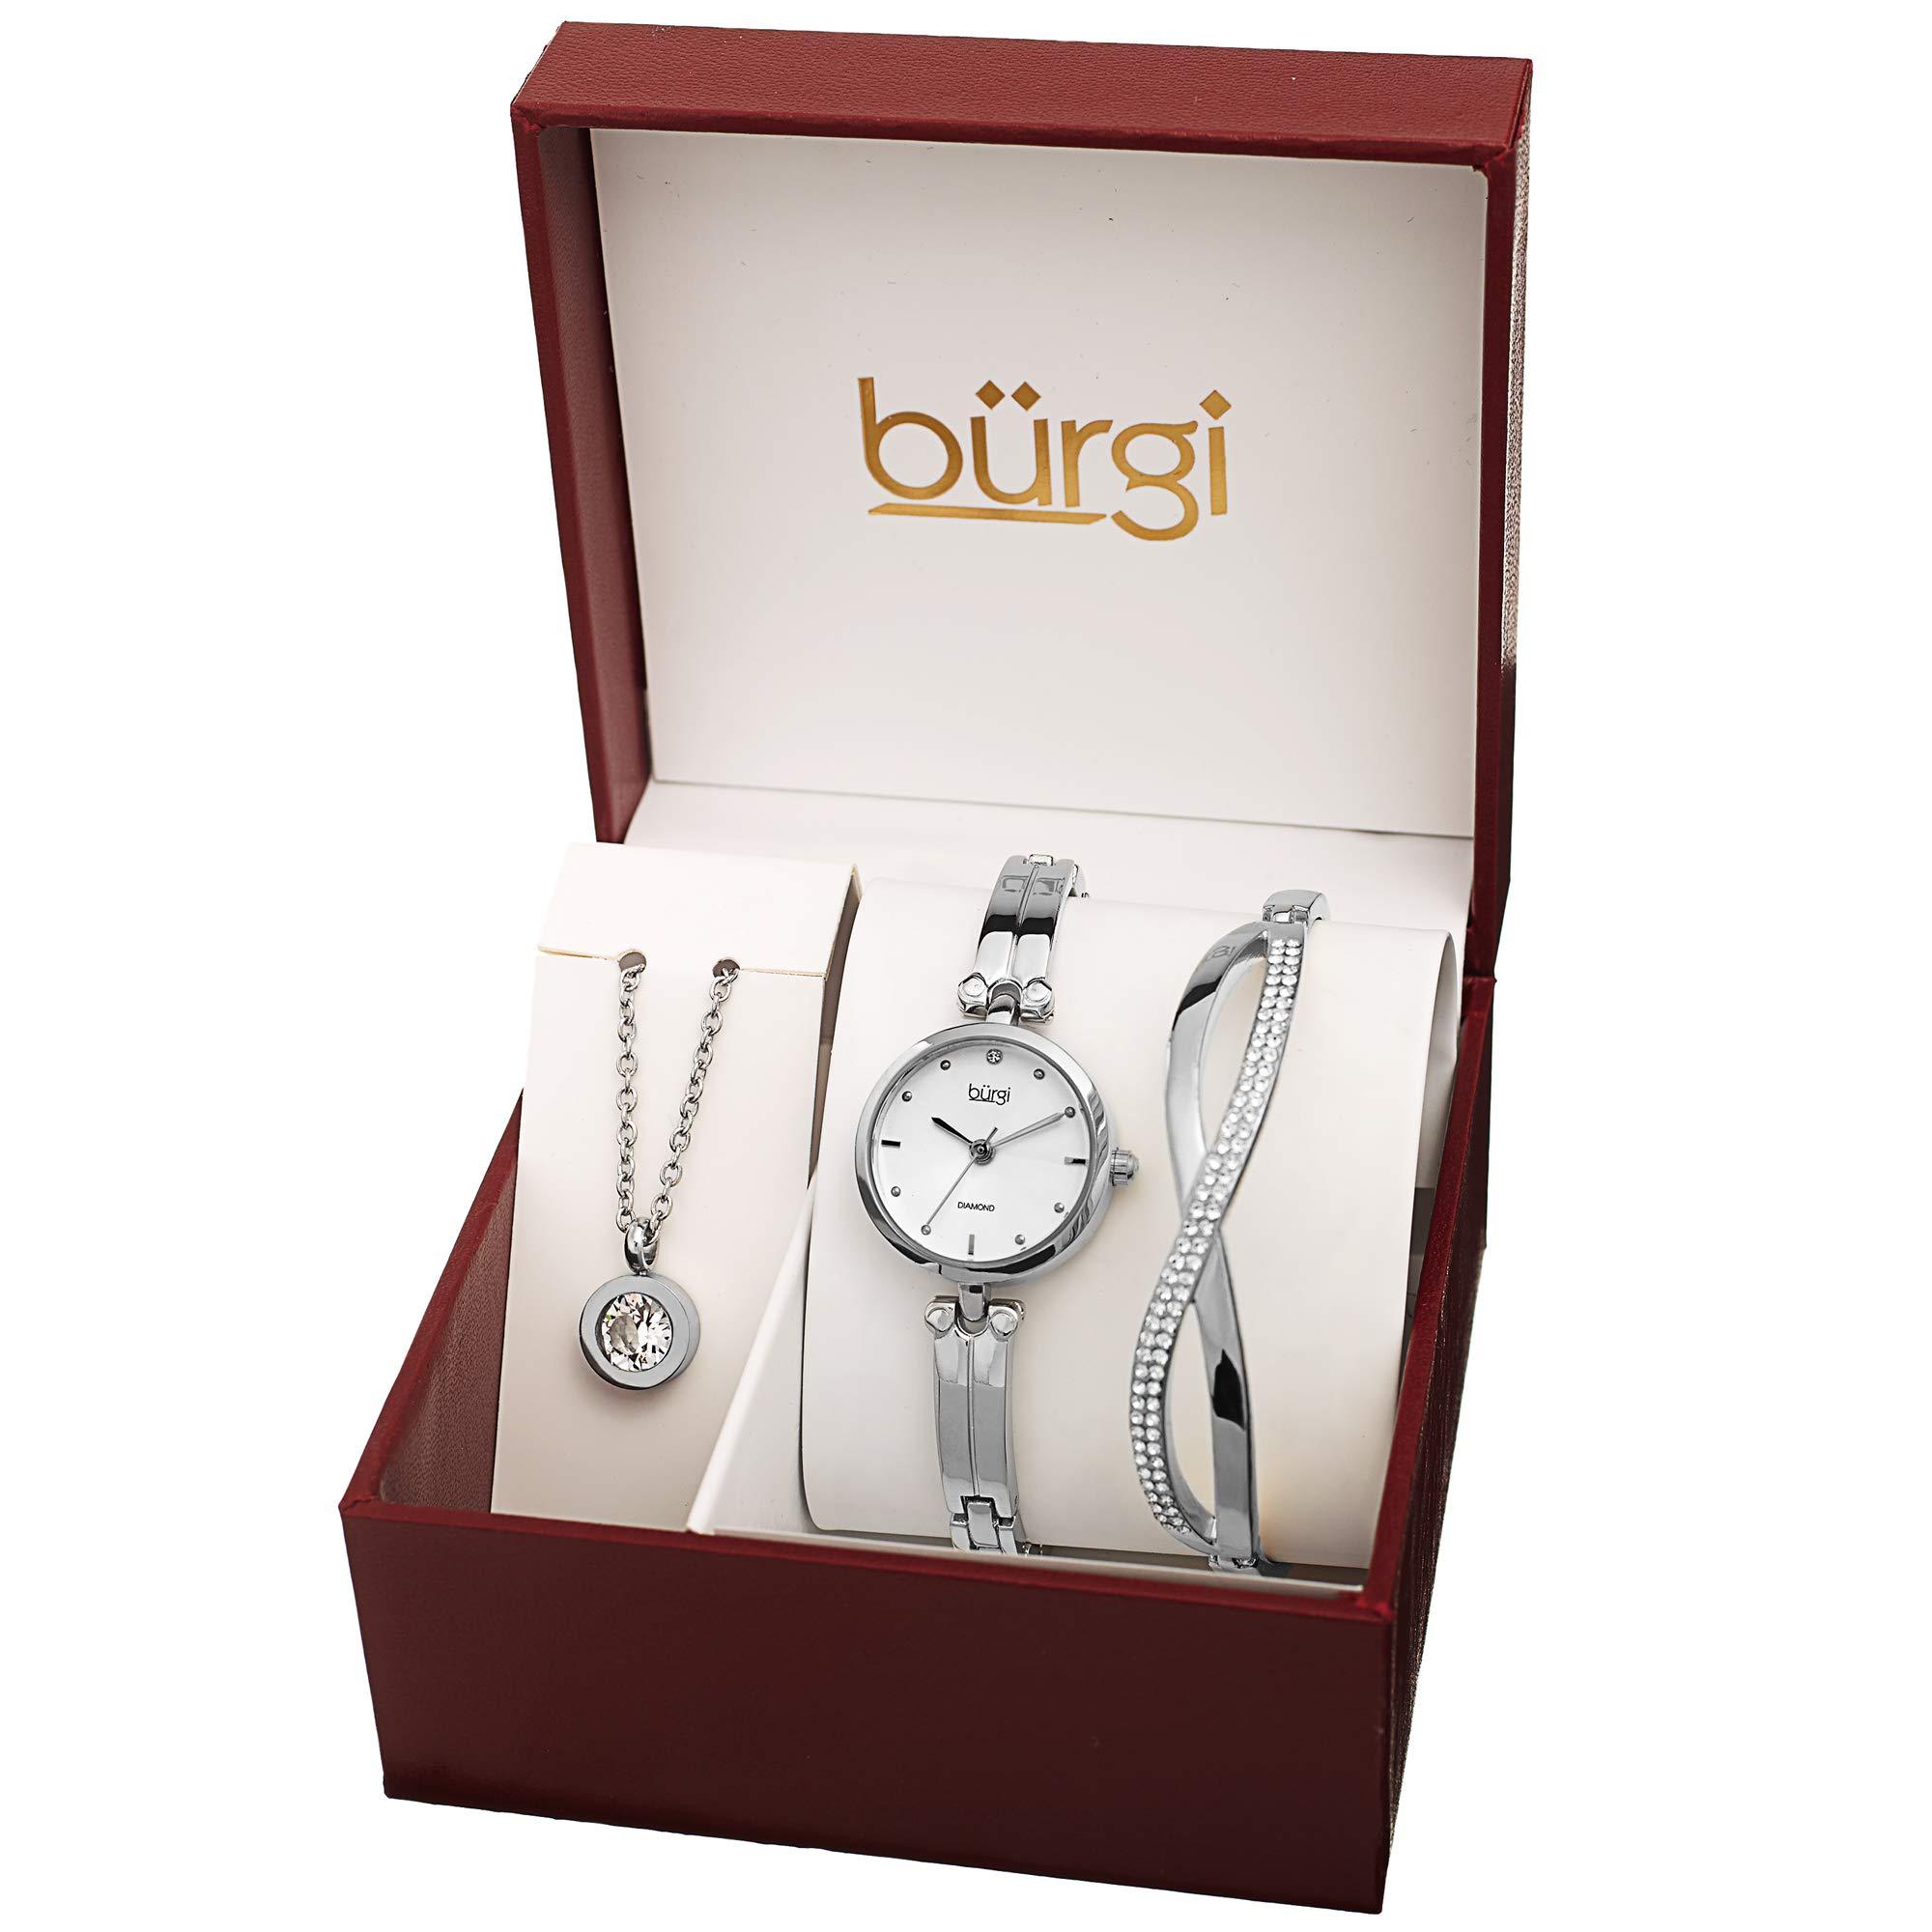 Burgi Women's Jewelry Gift Set - Half Bangle Diamond Watch, Swarovski Crystal Pendant Necklace and Bracelet - Flash Plated Silver - BUR212SS-S